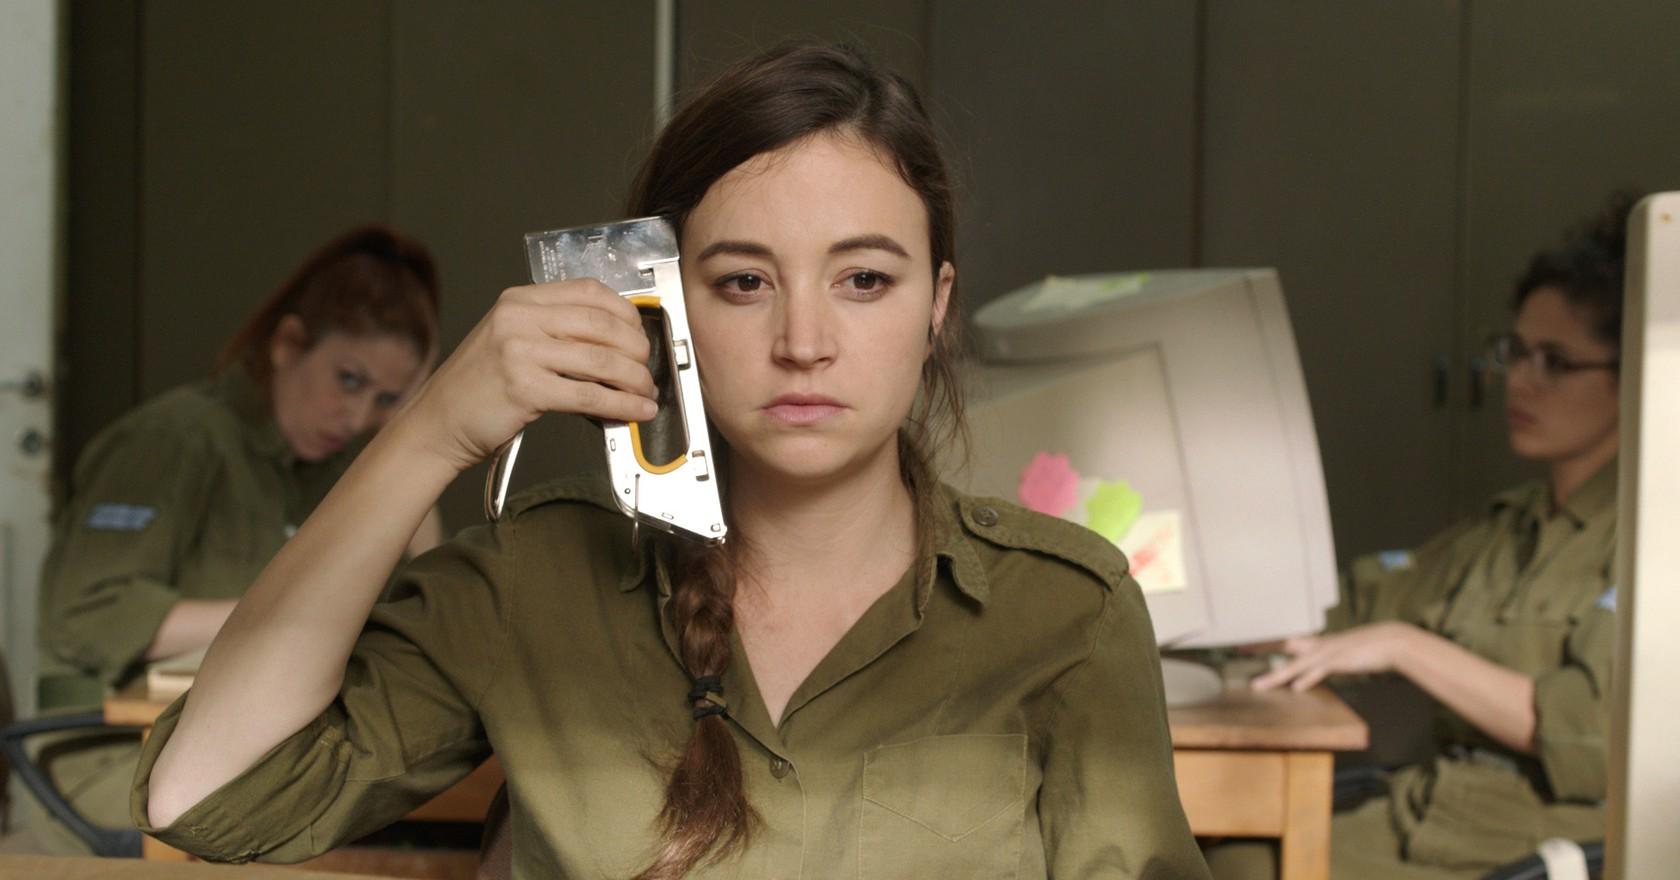 best israeli dating shows on amazon